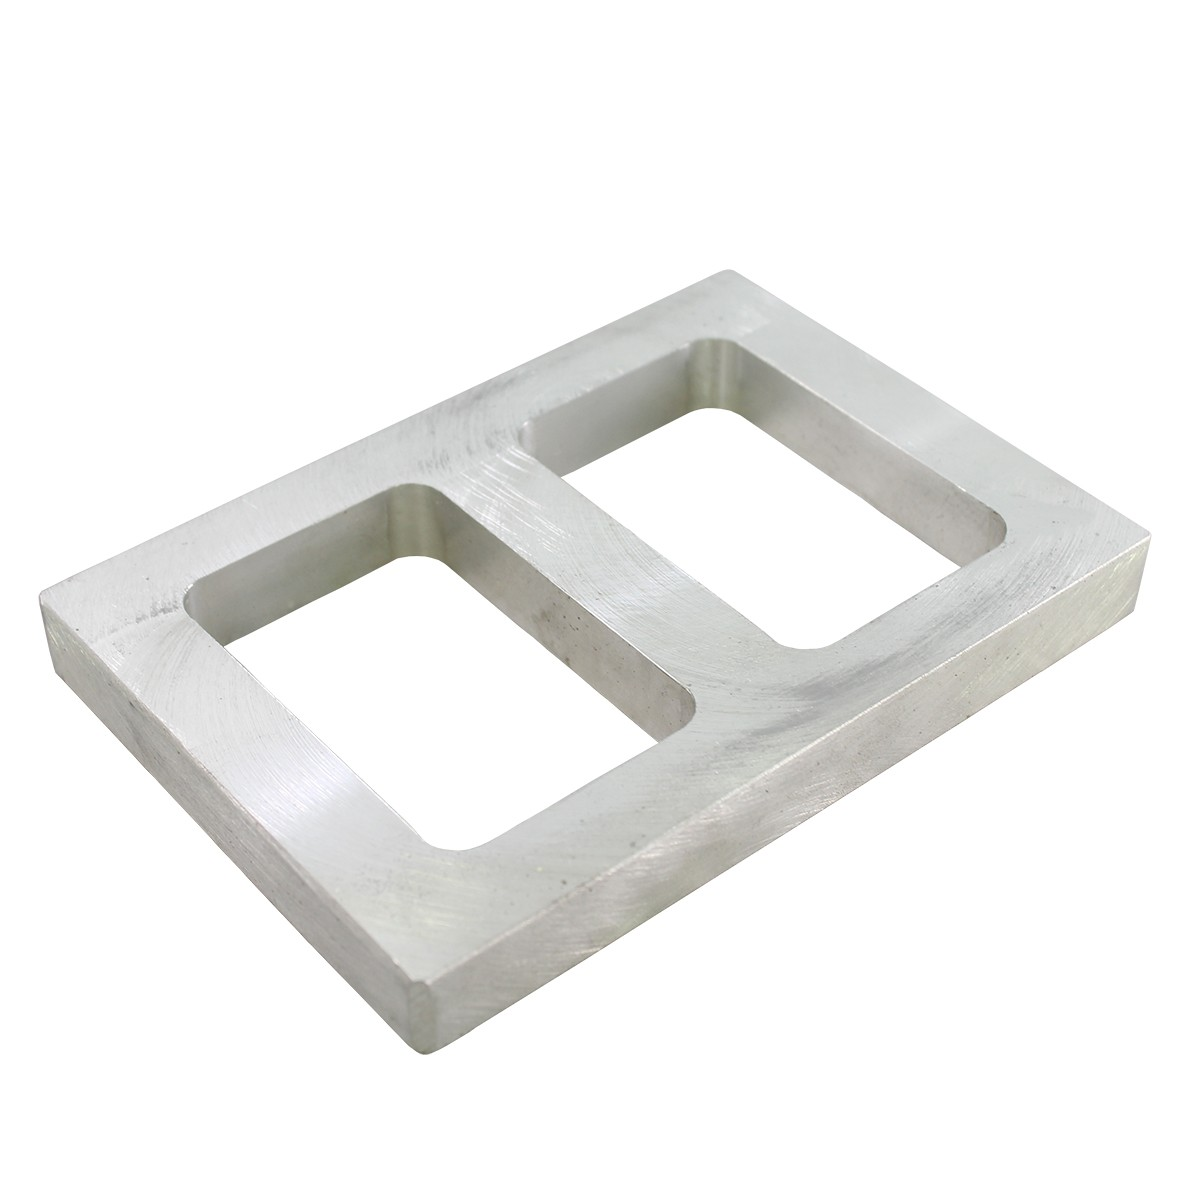 "Aluminum Double Mold Frames - 3/4"" x 1-7/8"" x 2-7/8"""